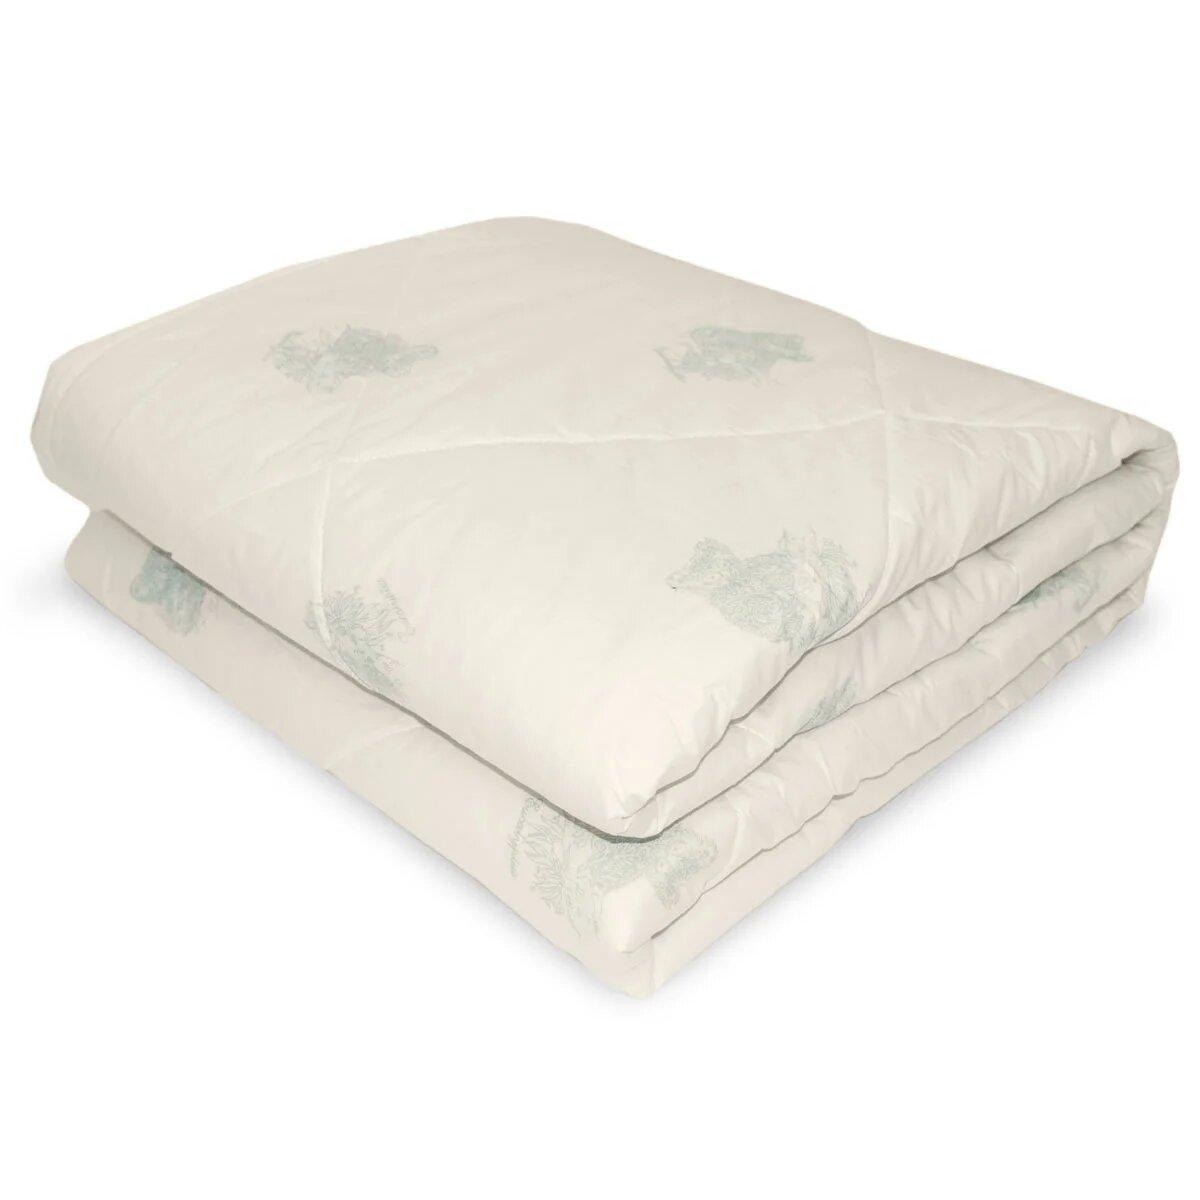 Одеяло CLASSIC by T 20.04.12.0071 Эвкалипт